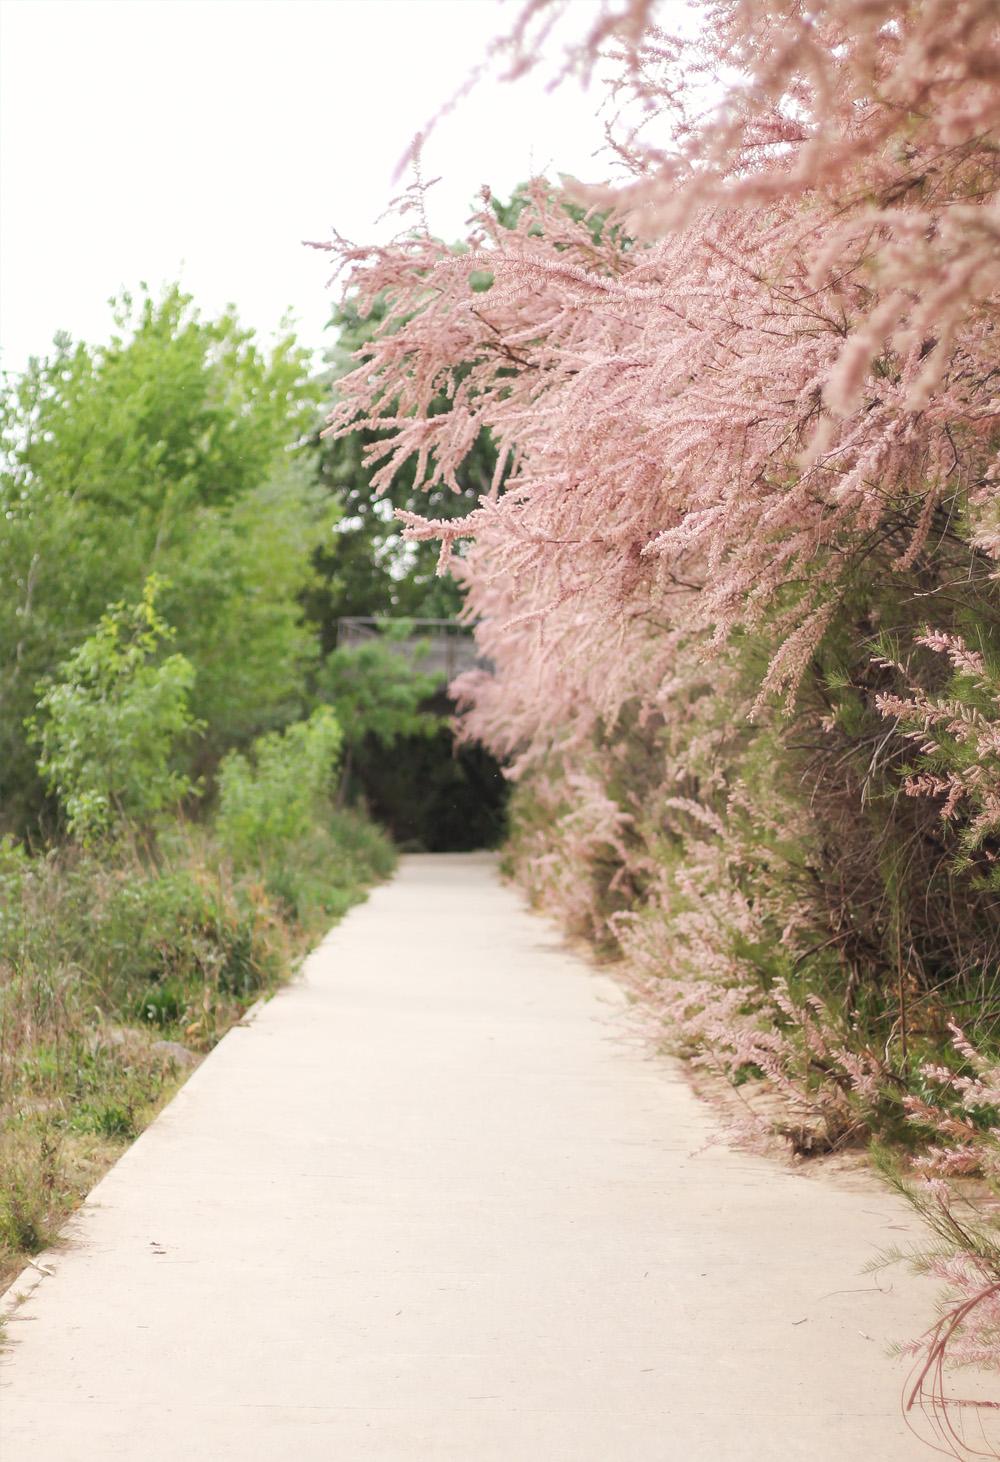 tamarindo paseo contemplativo zaragoza primavera